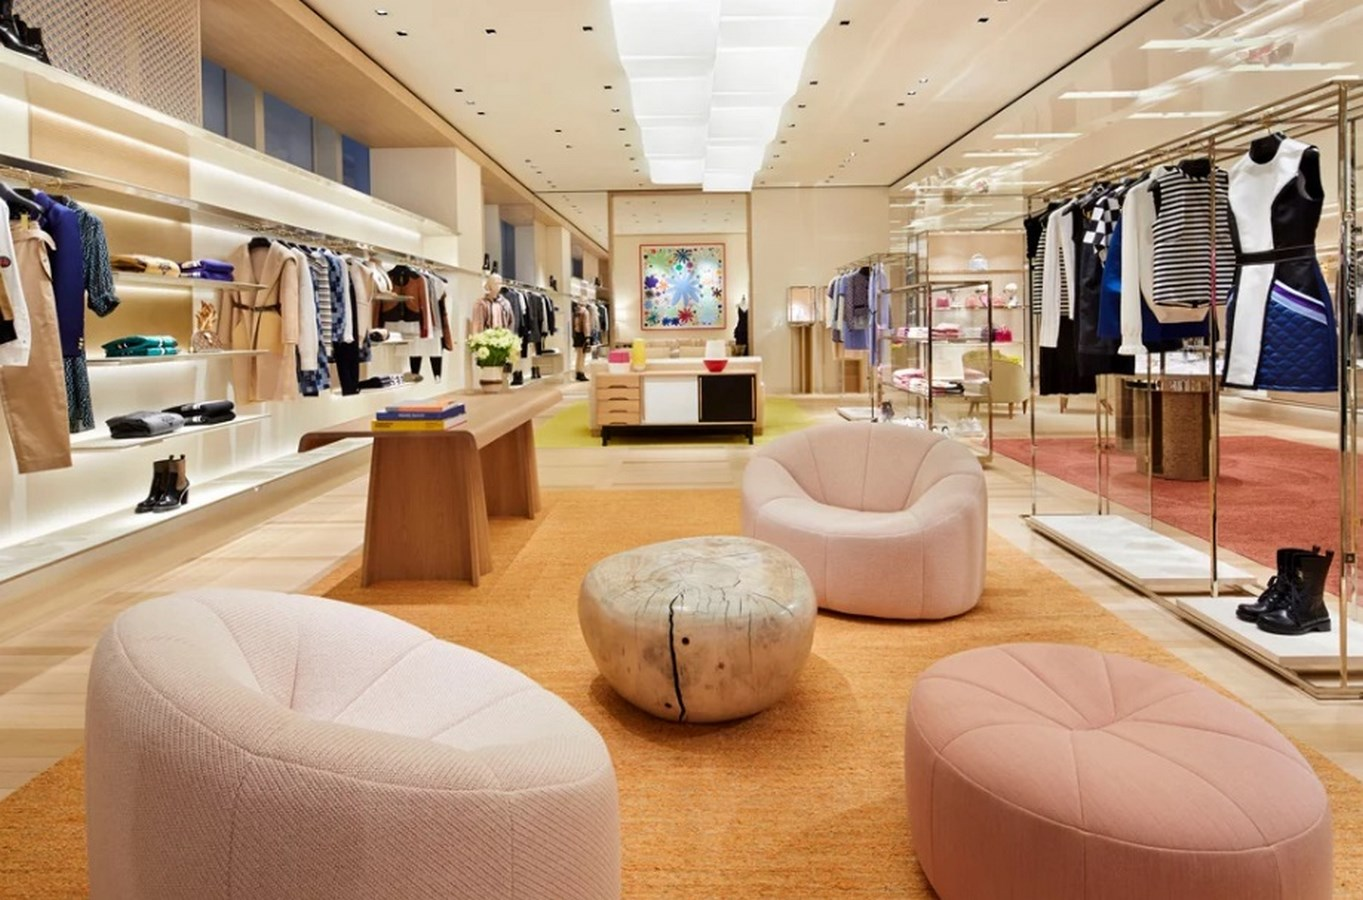 Louis Vuitton Store Osaka by Jun Aoki & Associates-An Amalgamation of Culture and Modern Architecture -9